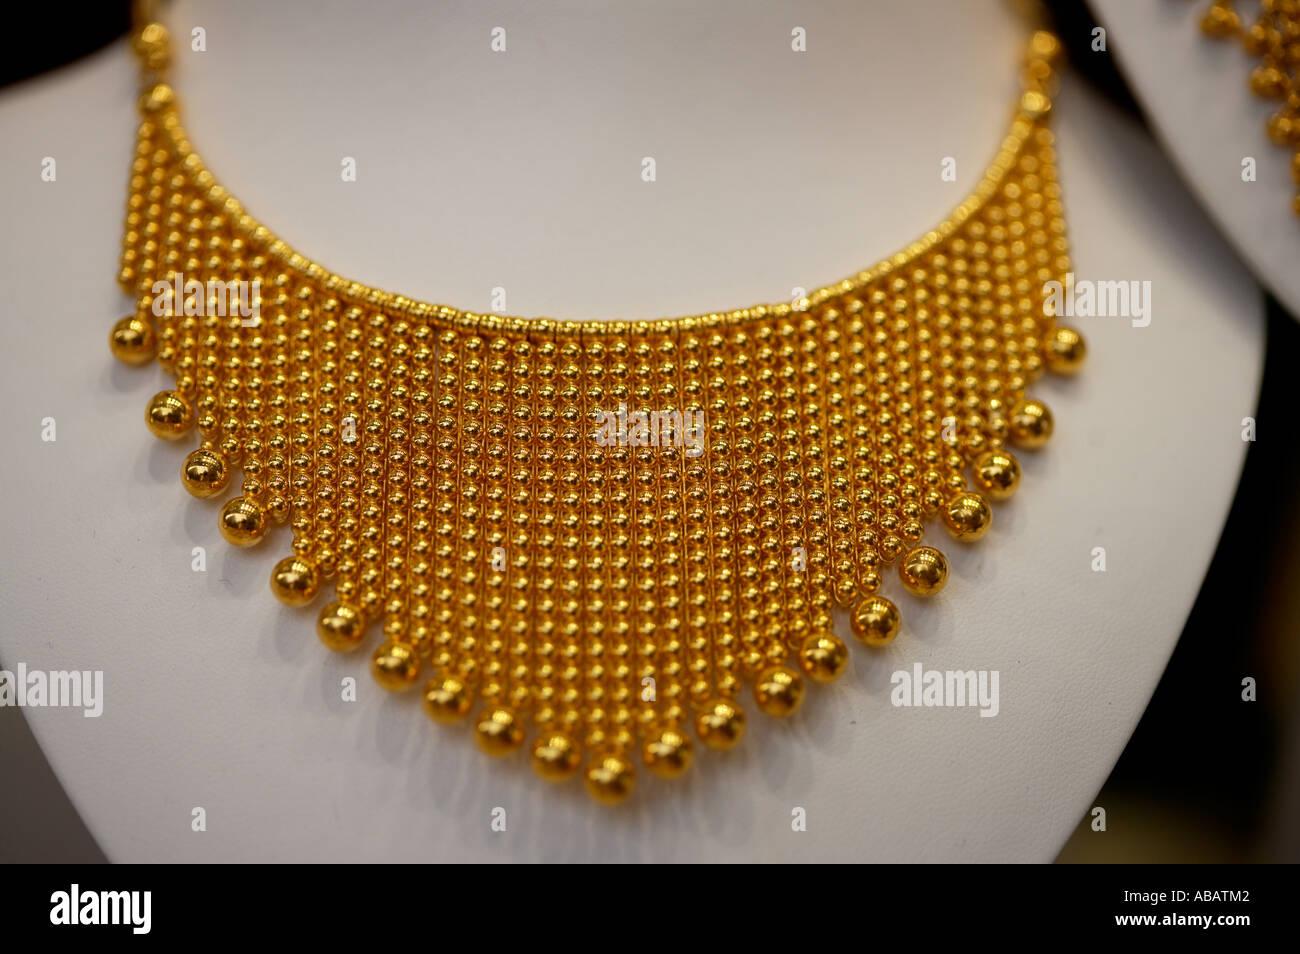 Dubai, Gold Souk, Necklace - Stock Image